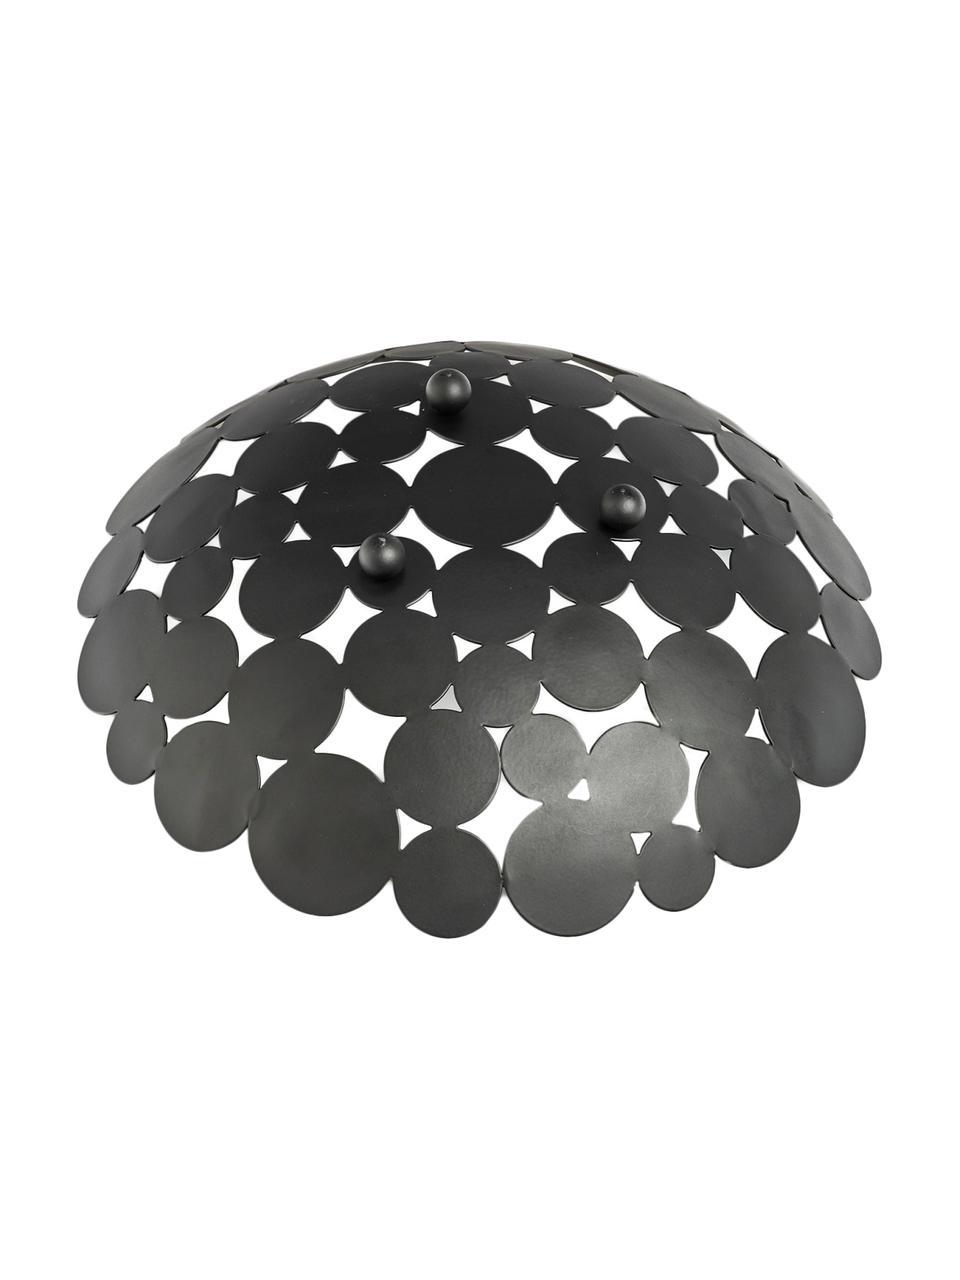 Schwarze Aufbewahrungsschale Drops, Metall, beschichtet, Schwarz, Ø 29 x H 9 cm